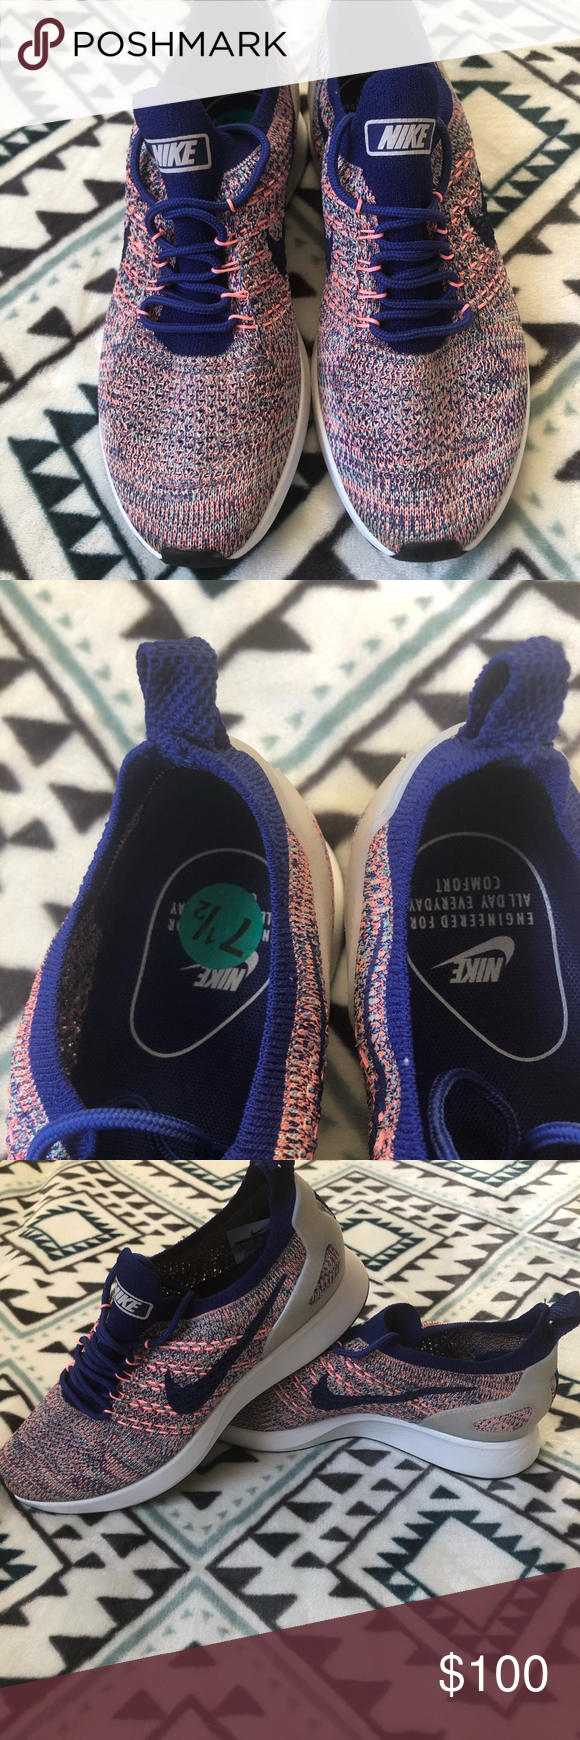 Women Nike Yoga Shoes on Poshmark